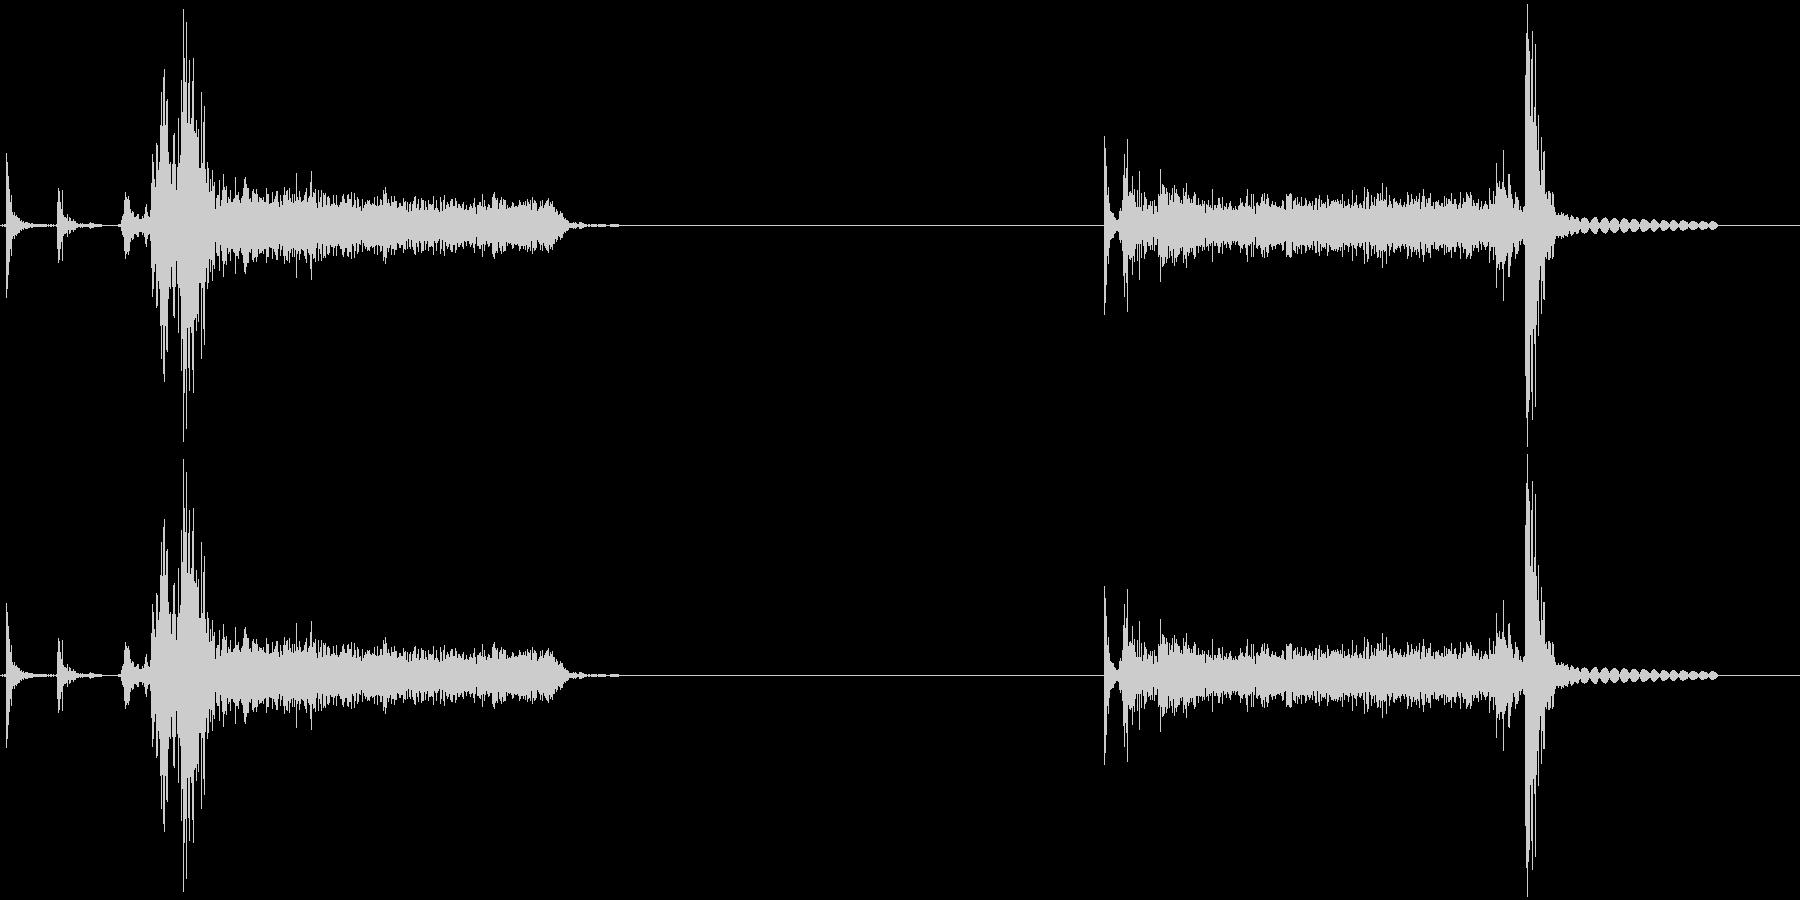 Bluerayデッキのトレイ出し入れ音の未再生の波形